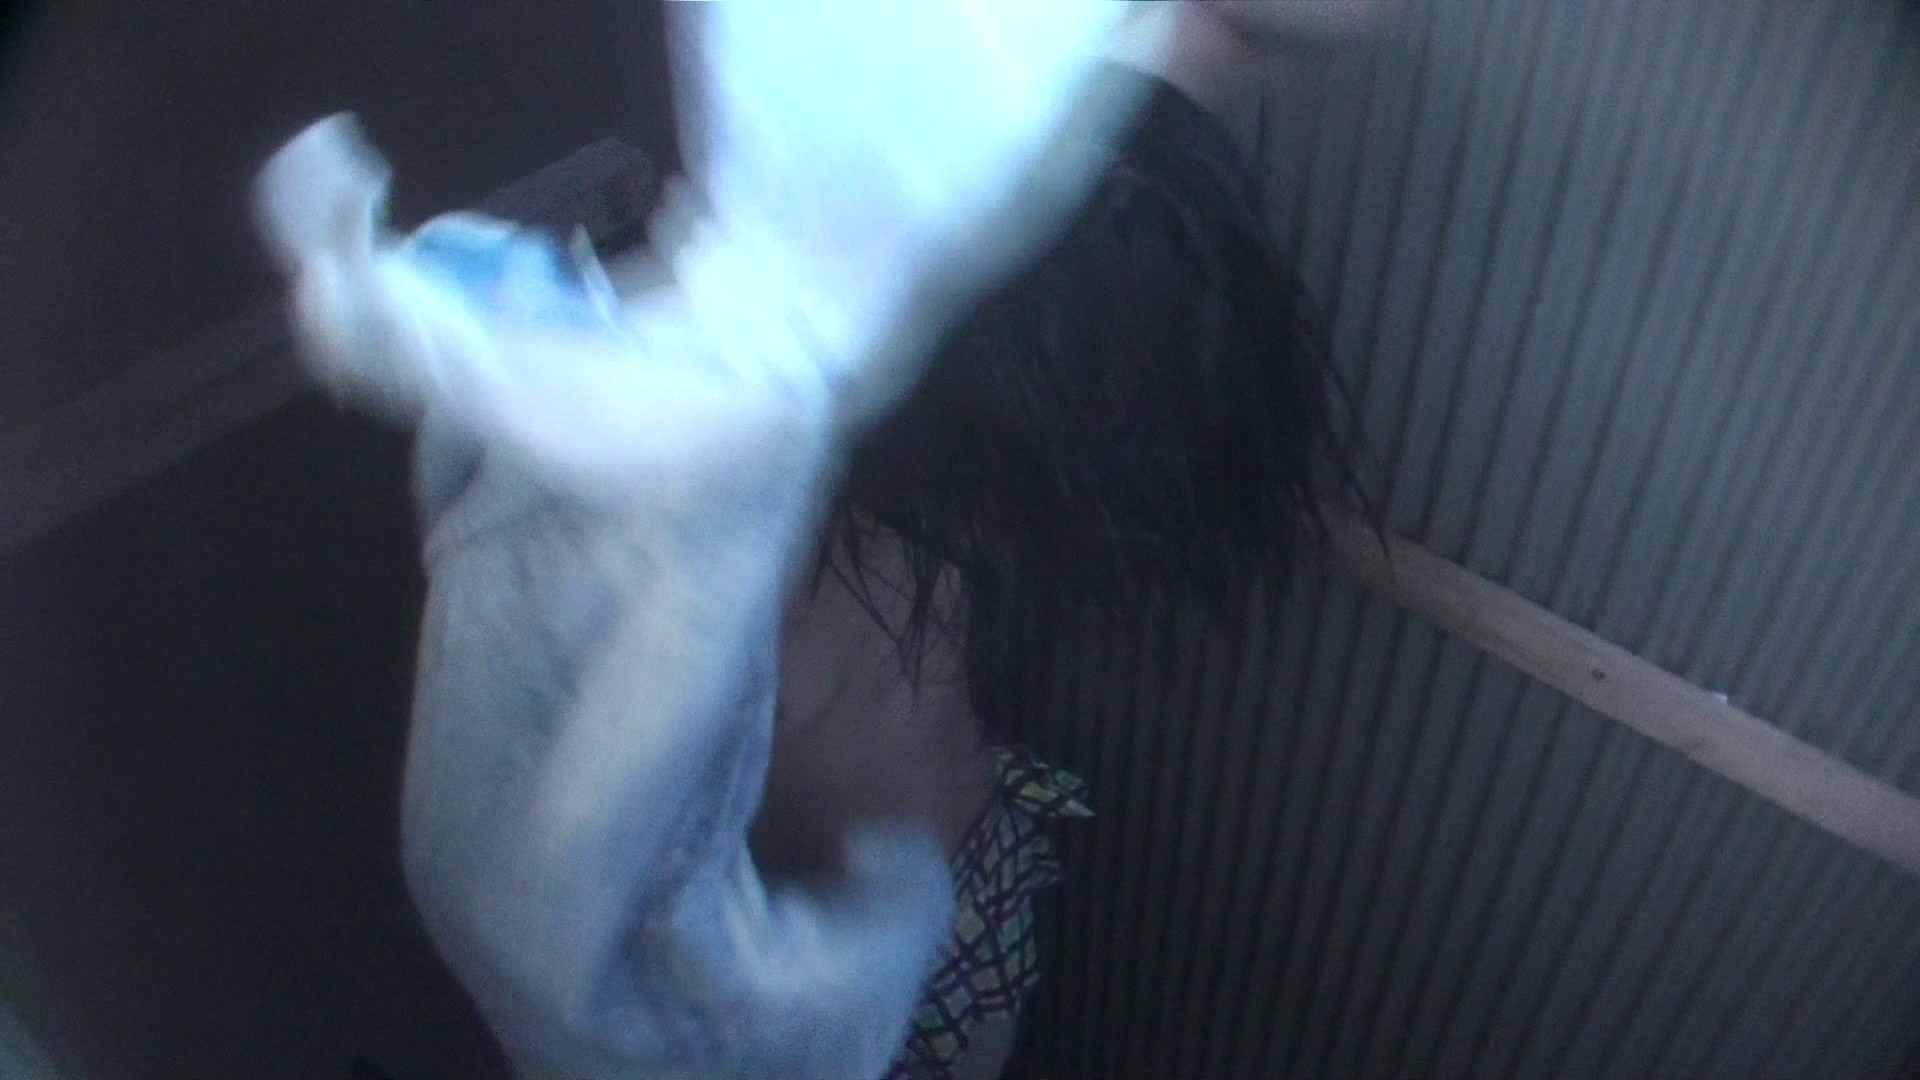 Vol.24 再登場 生理中の年齢不詳嬢 盗撮  110PIX 34